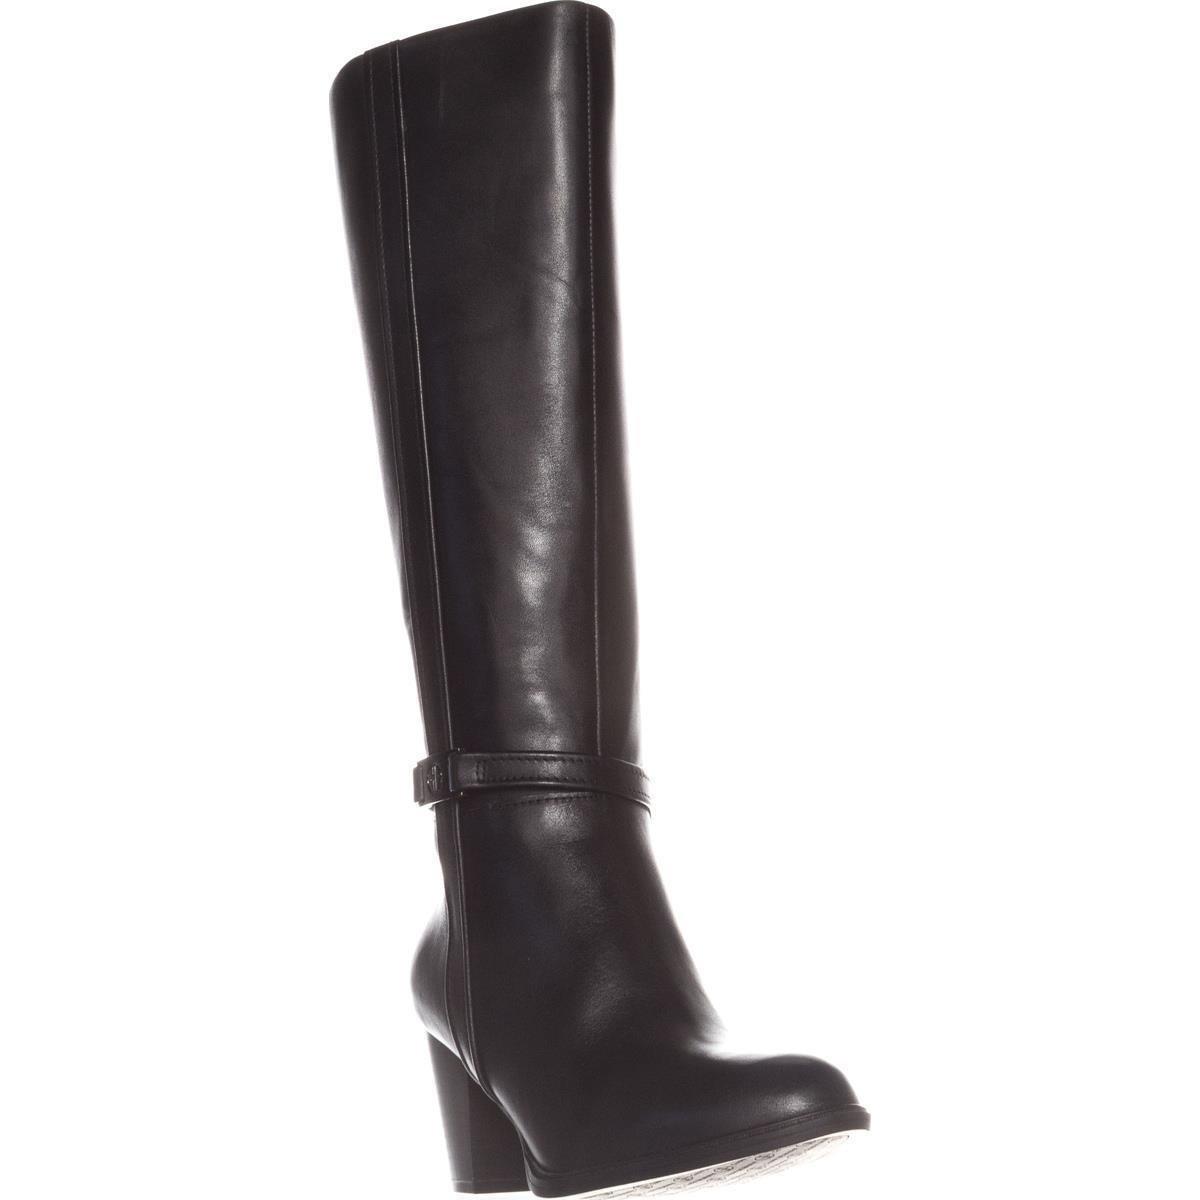 Giani Bernini Frauen Raiven2 Pumps Rund Leder Fashion Stiefel